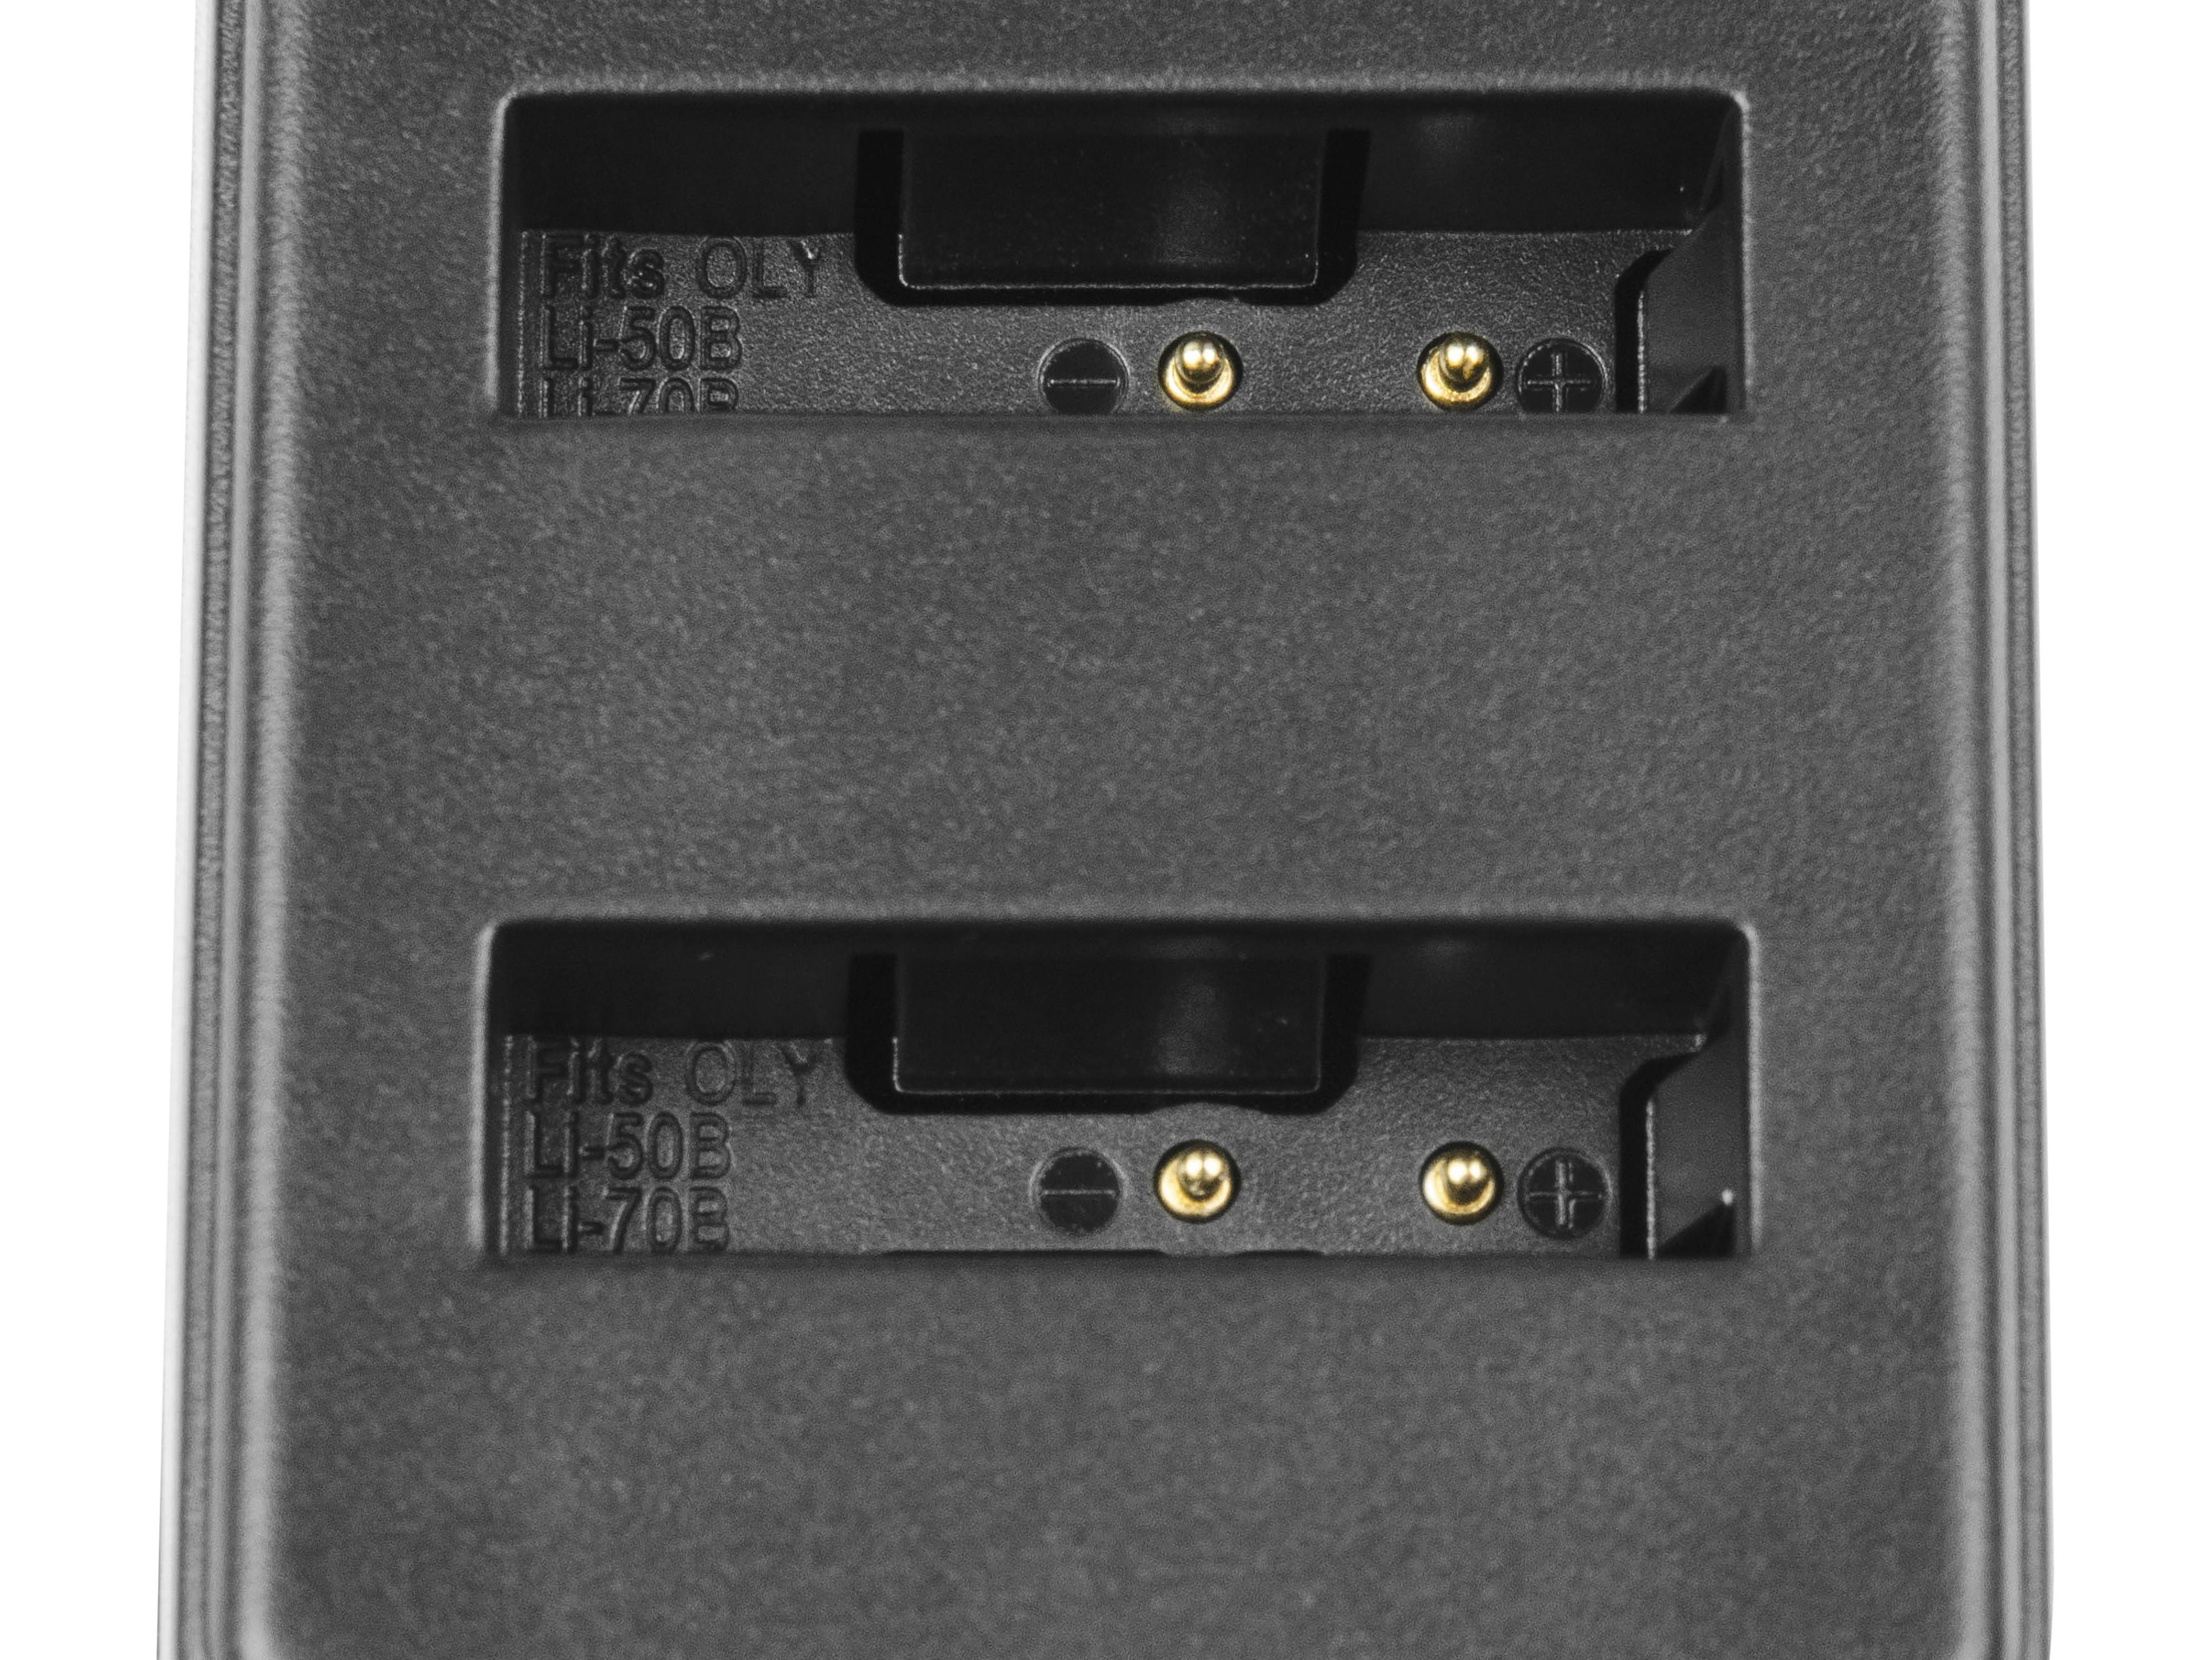 Double Charger LI-50C Green Cell ® for Olympus LI-50B, SZ-15 SZ-16 Tough 6000 8000 TG-810 TG-820 TG-830 TG-850 VR-370 XZ-1